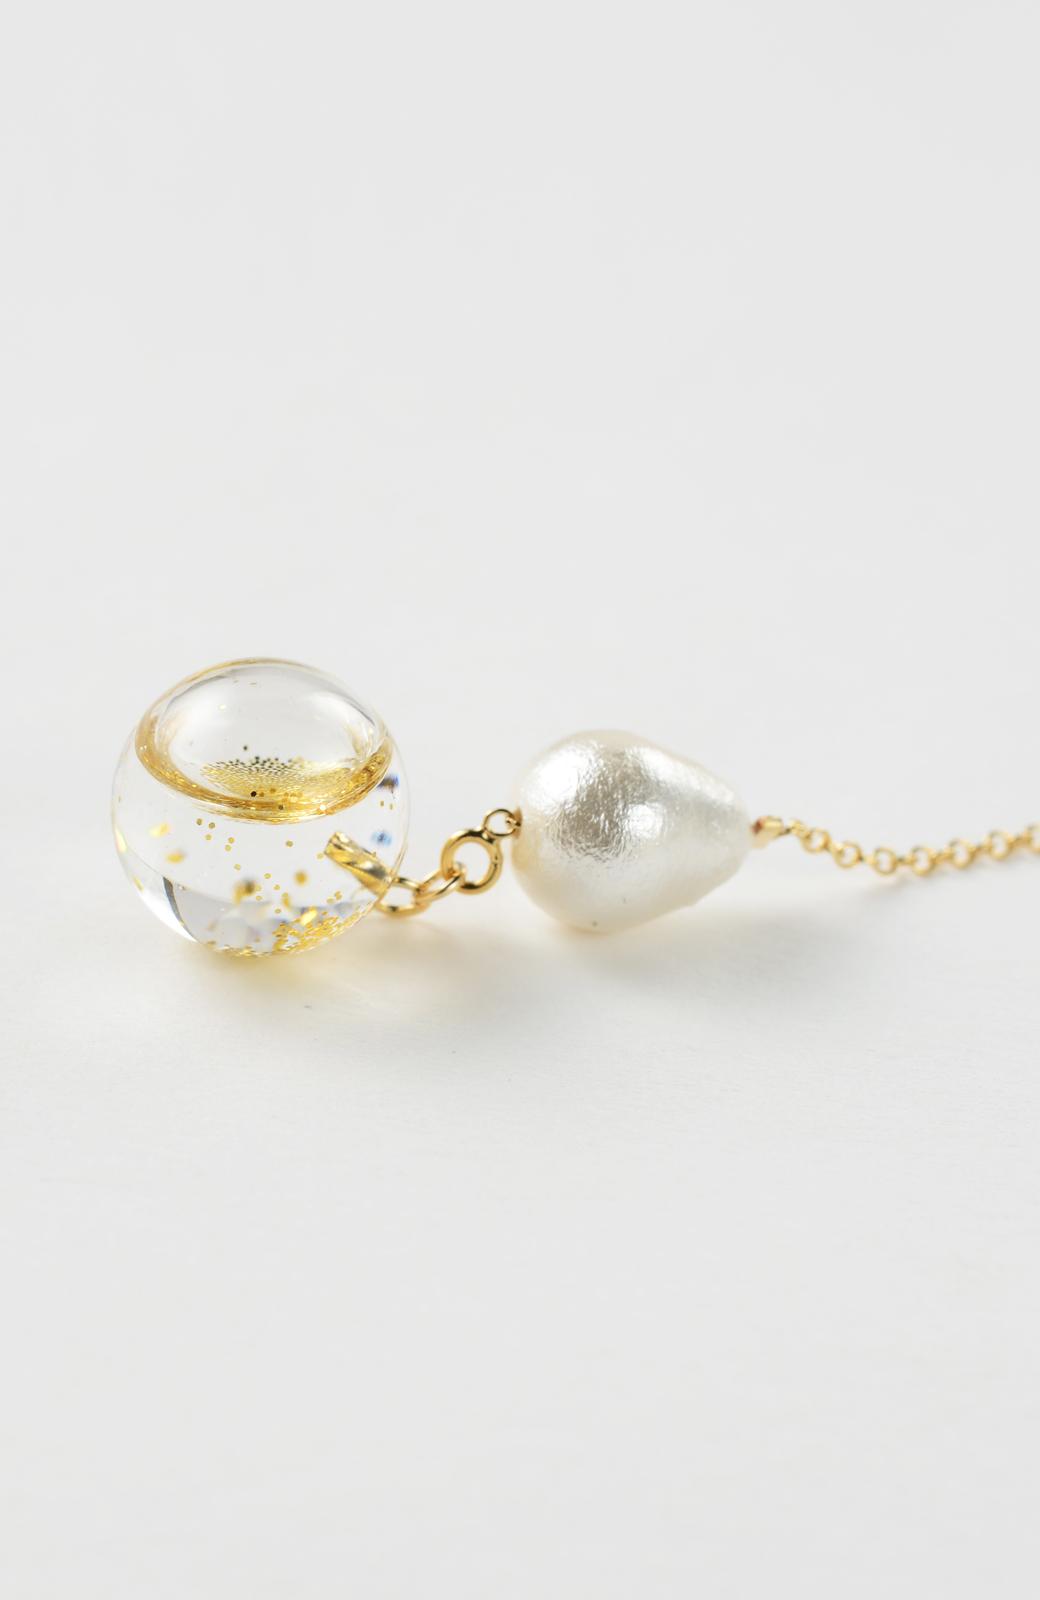 haco! てとひとて KANA MATSUNAMI チャリティー企画 Glass dome American chain ピアス <ゴールド>の商品写真3